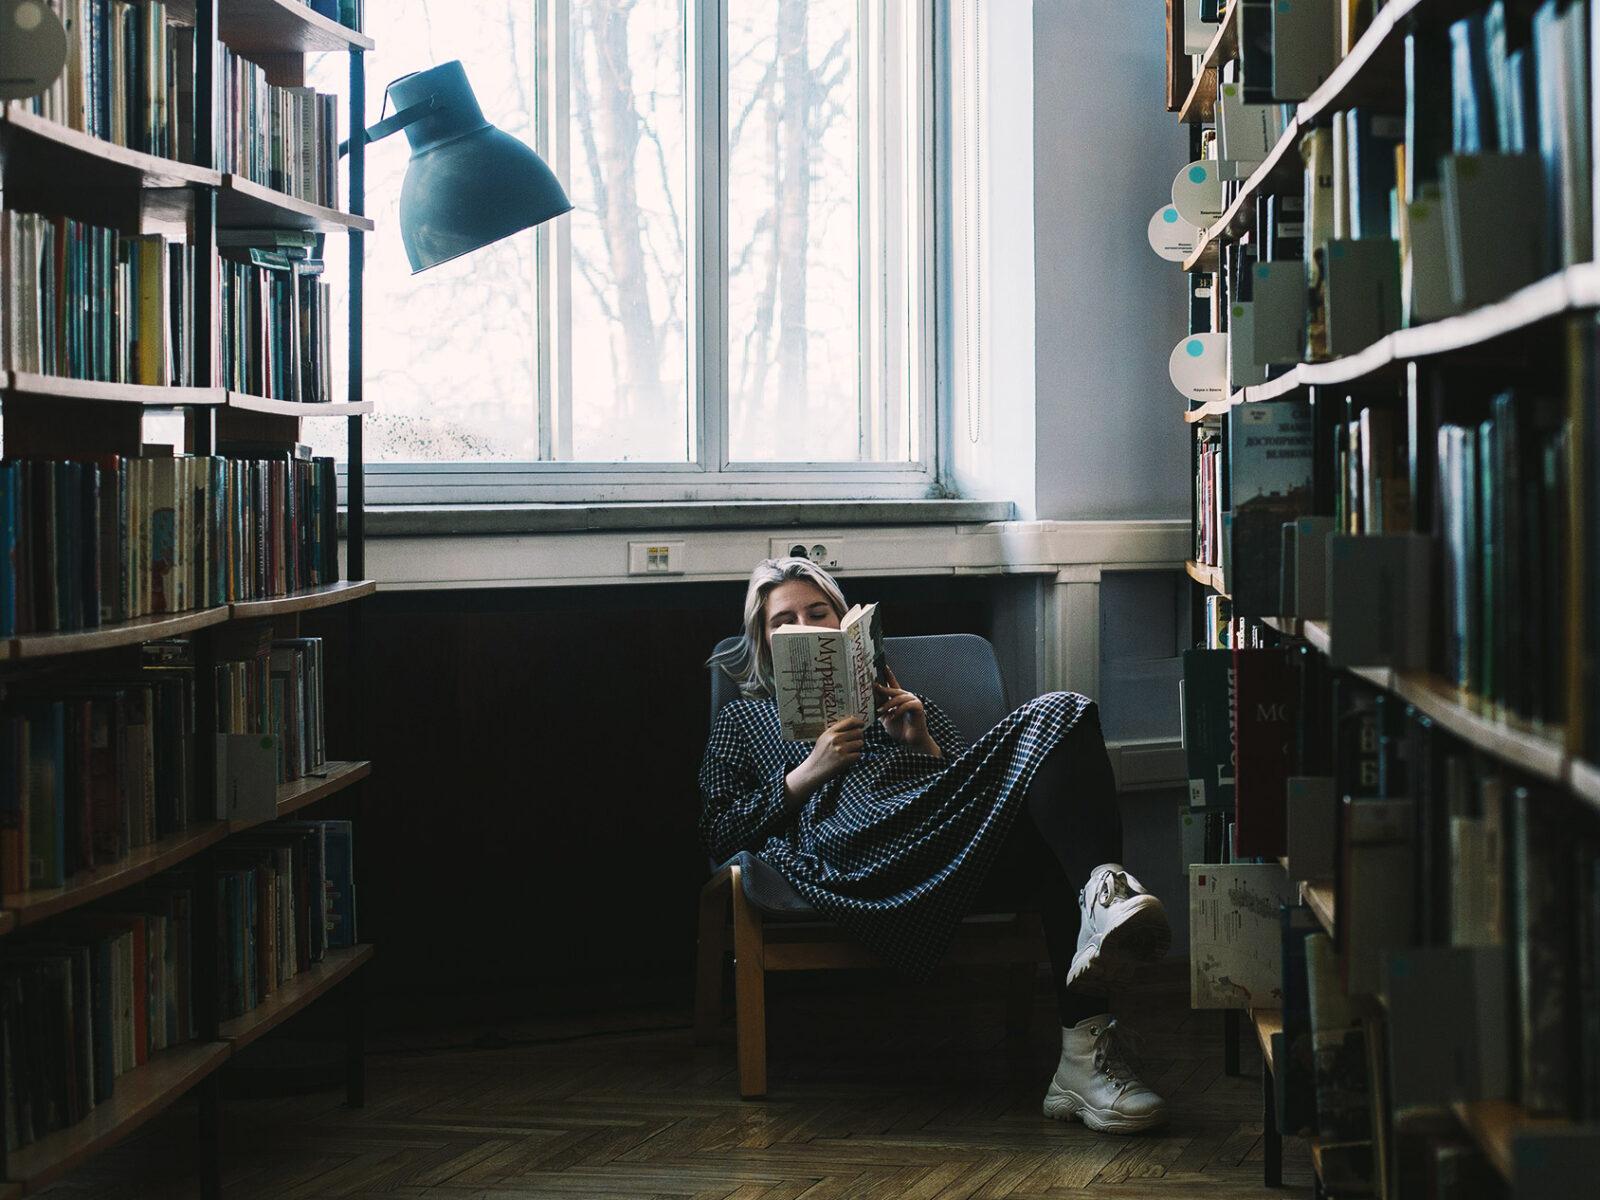 bibliotek, läsa, böcker